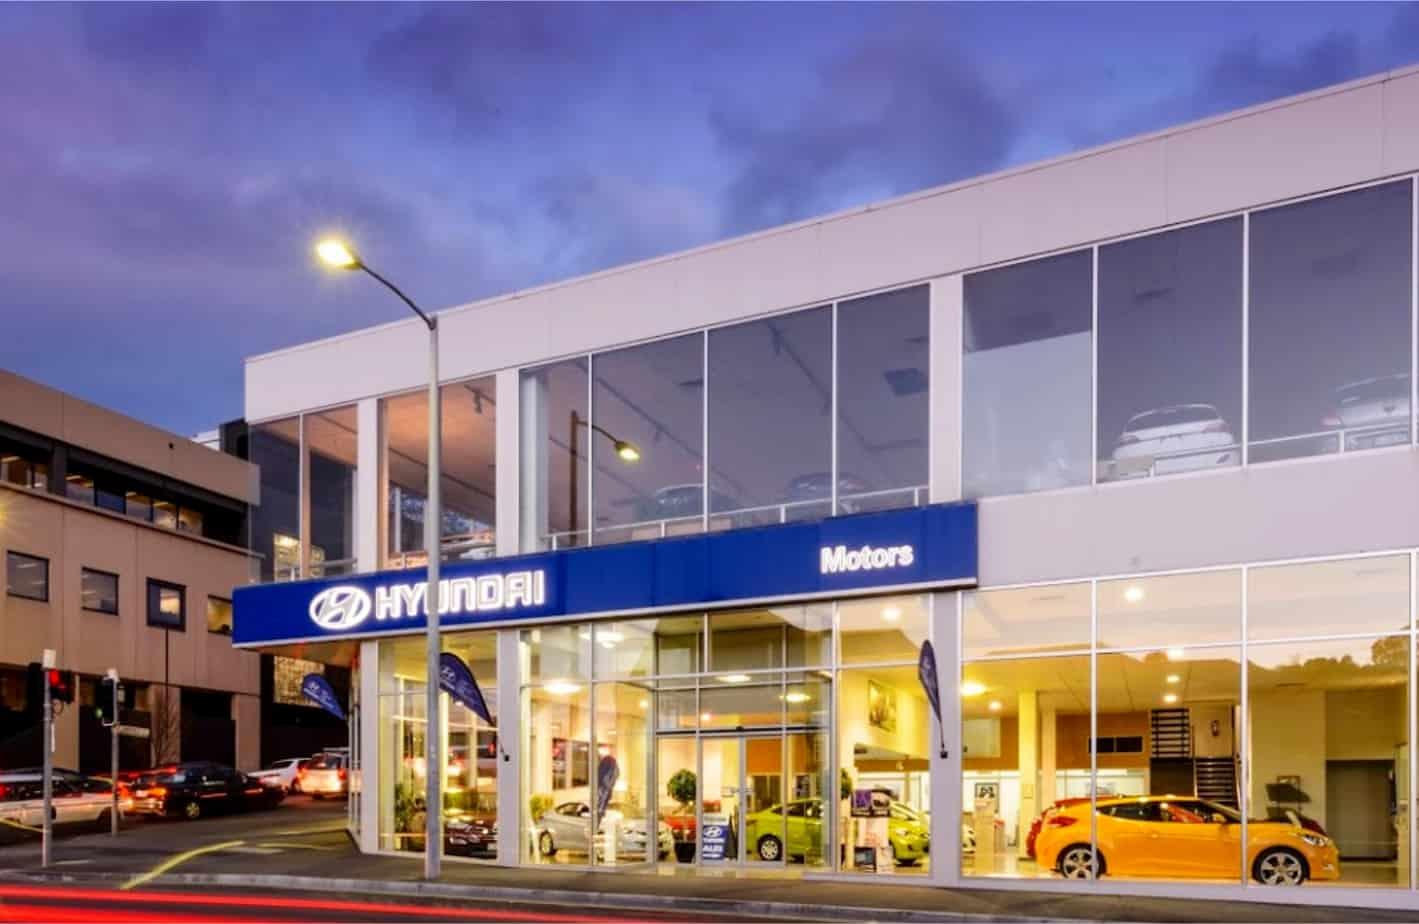 car dealer hobart barrack st &, collins st, hobart tas 7000 hyundai car dealerships